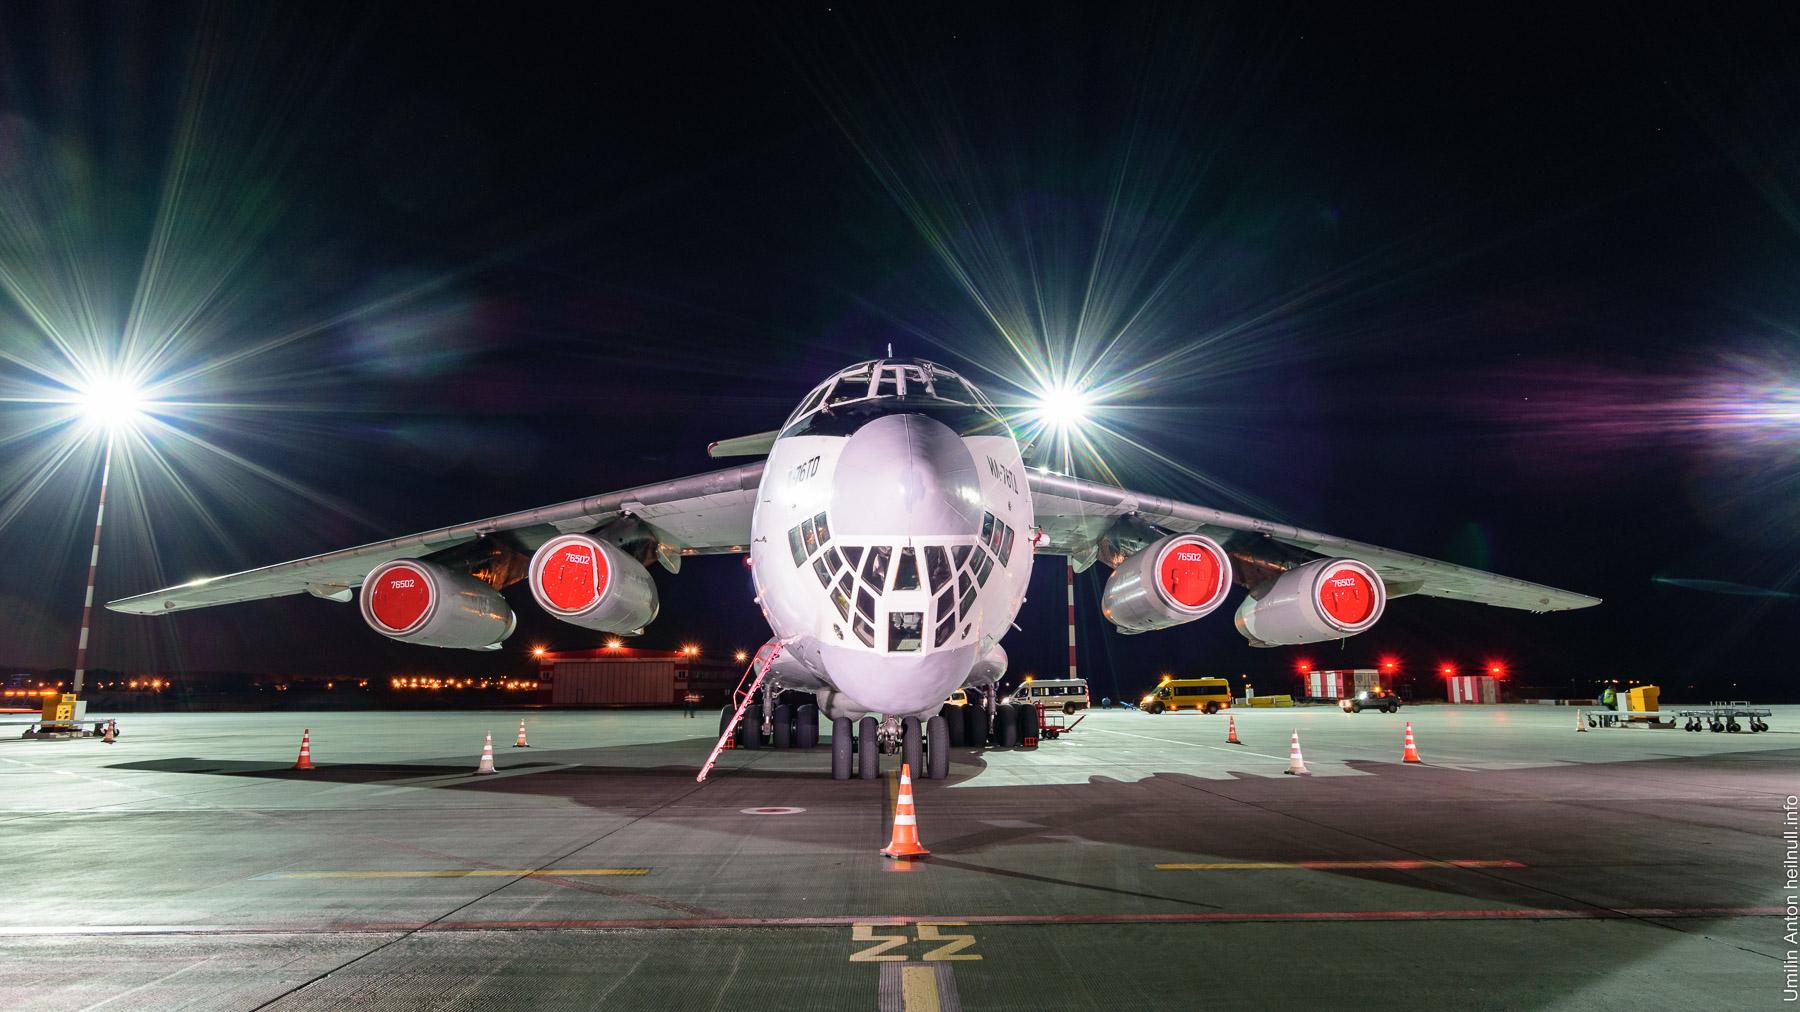 UAY_4869-8